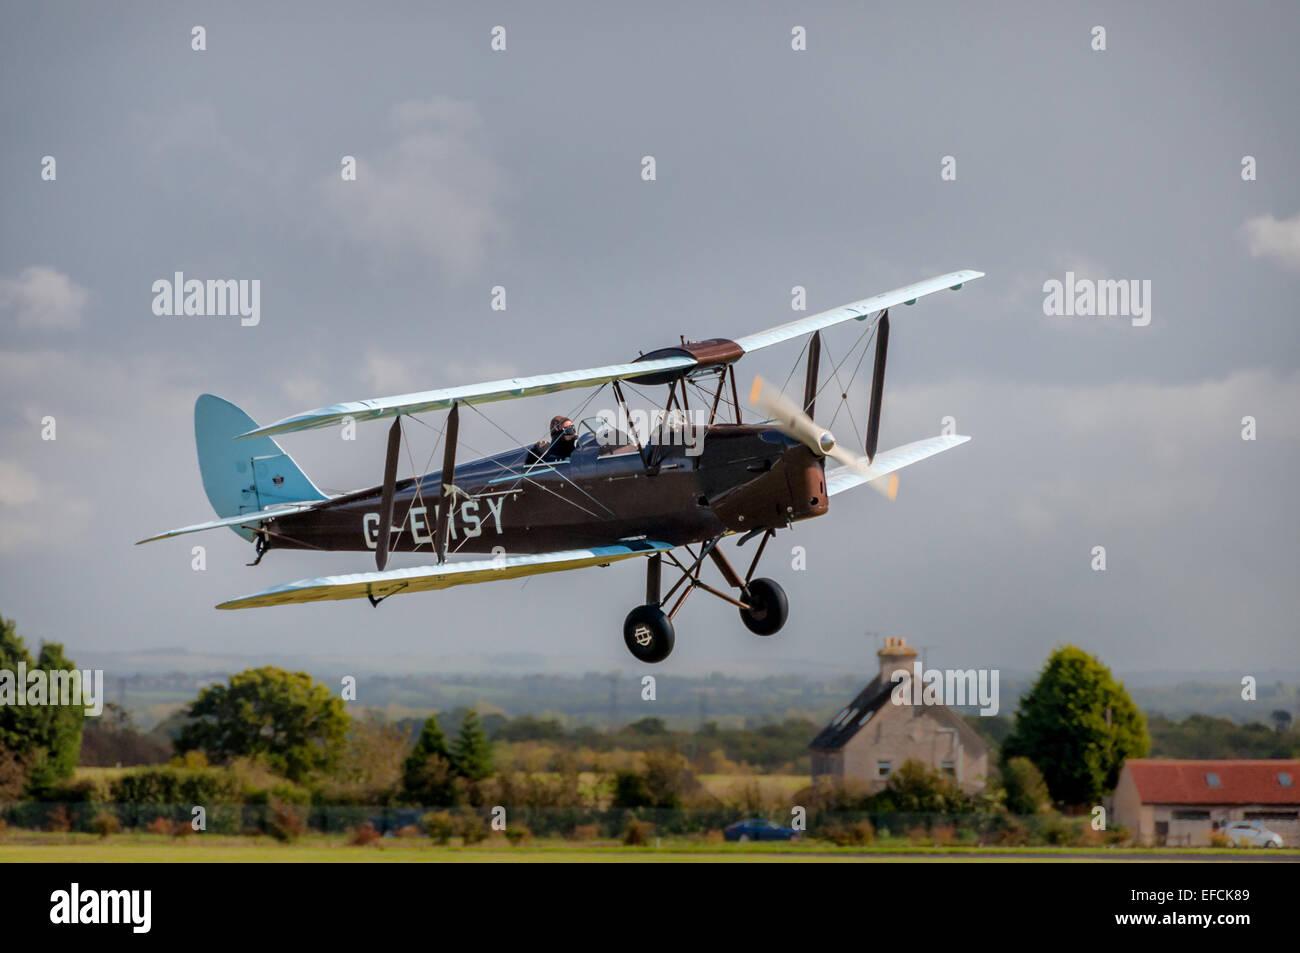 De Havilland Tiger Moth, 1930s biplane at Kemble Airshow - Stock Image